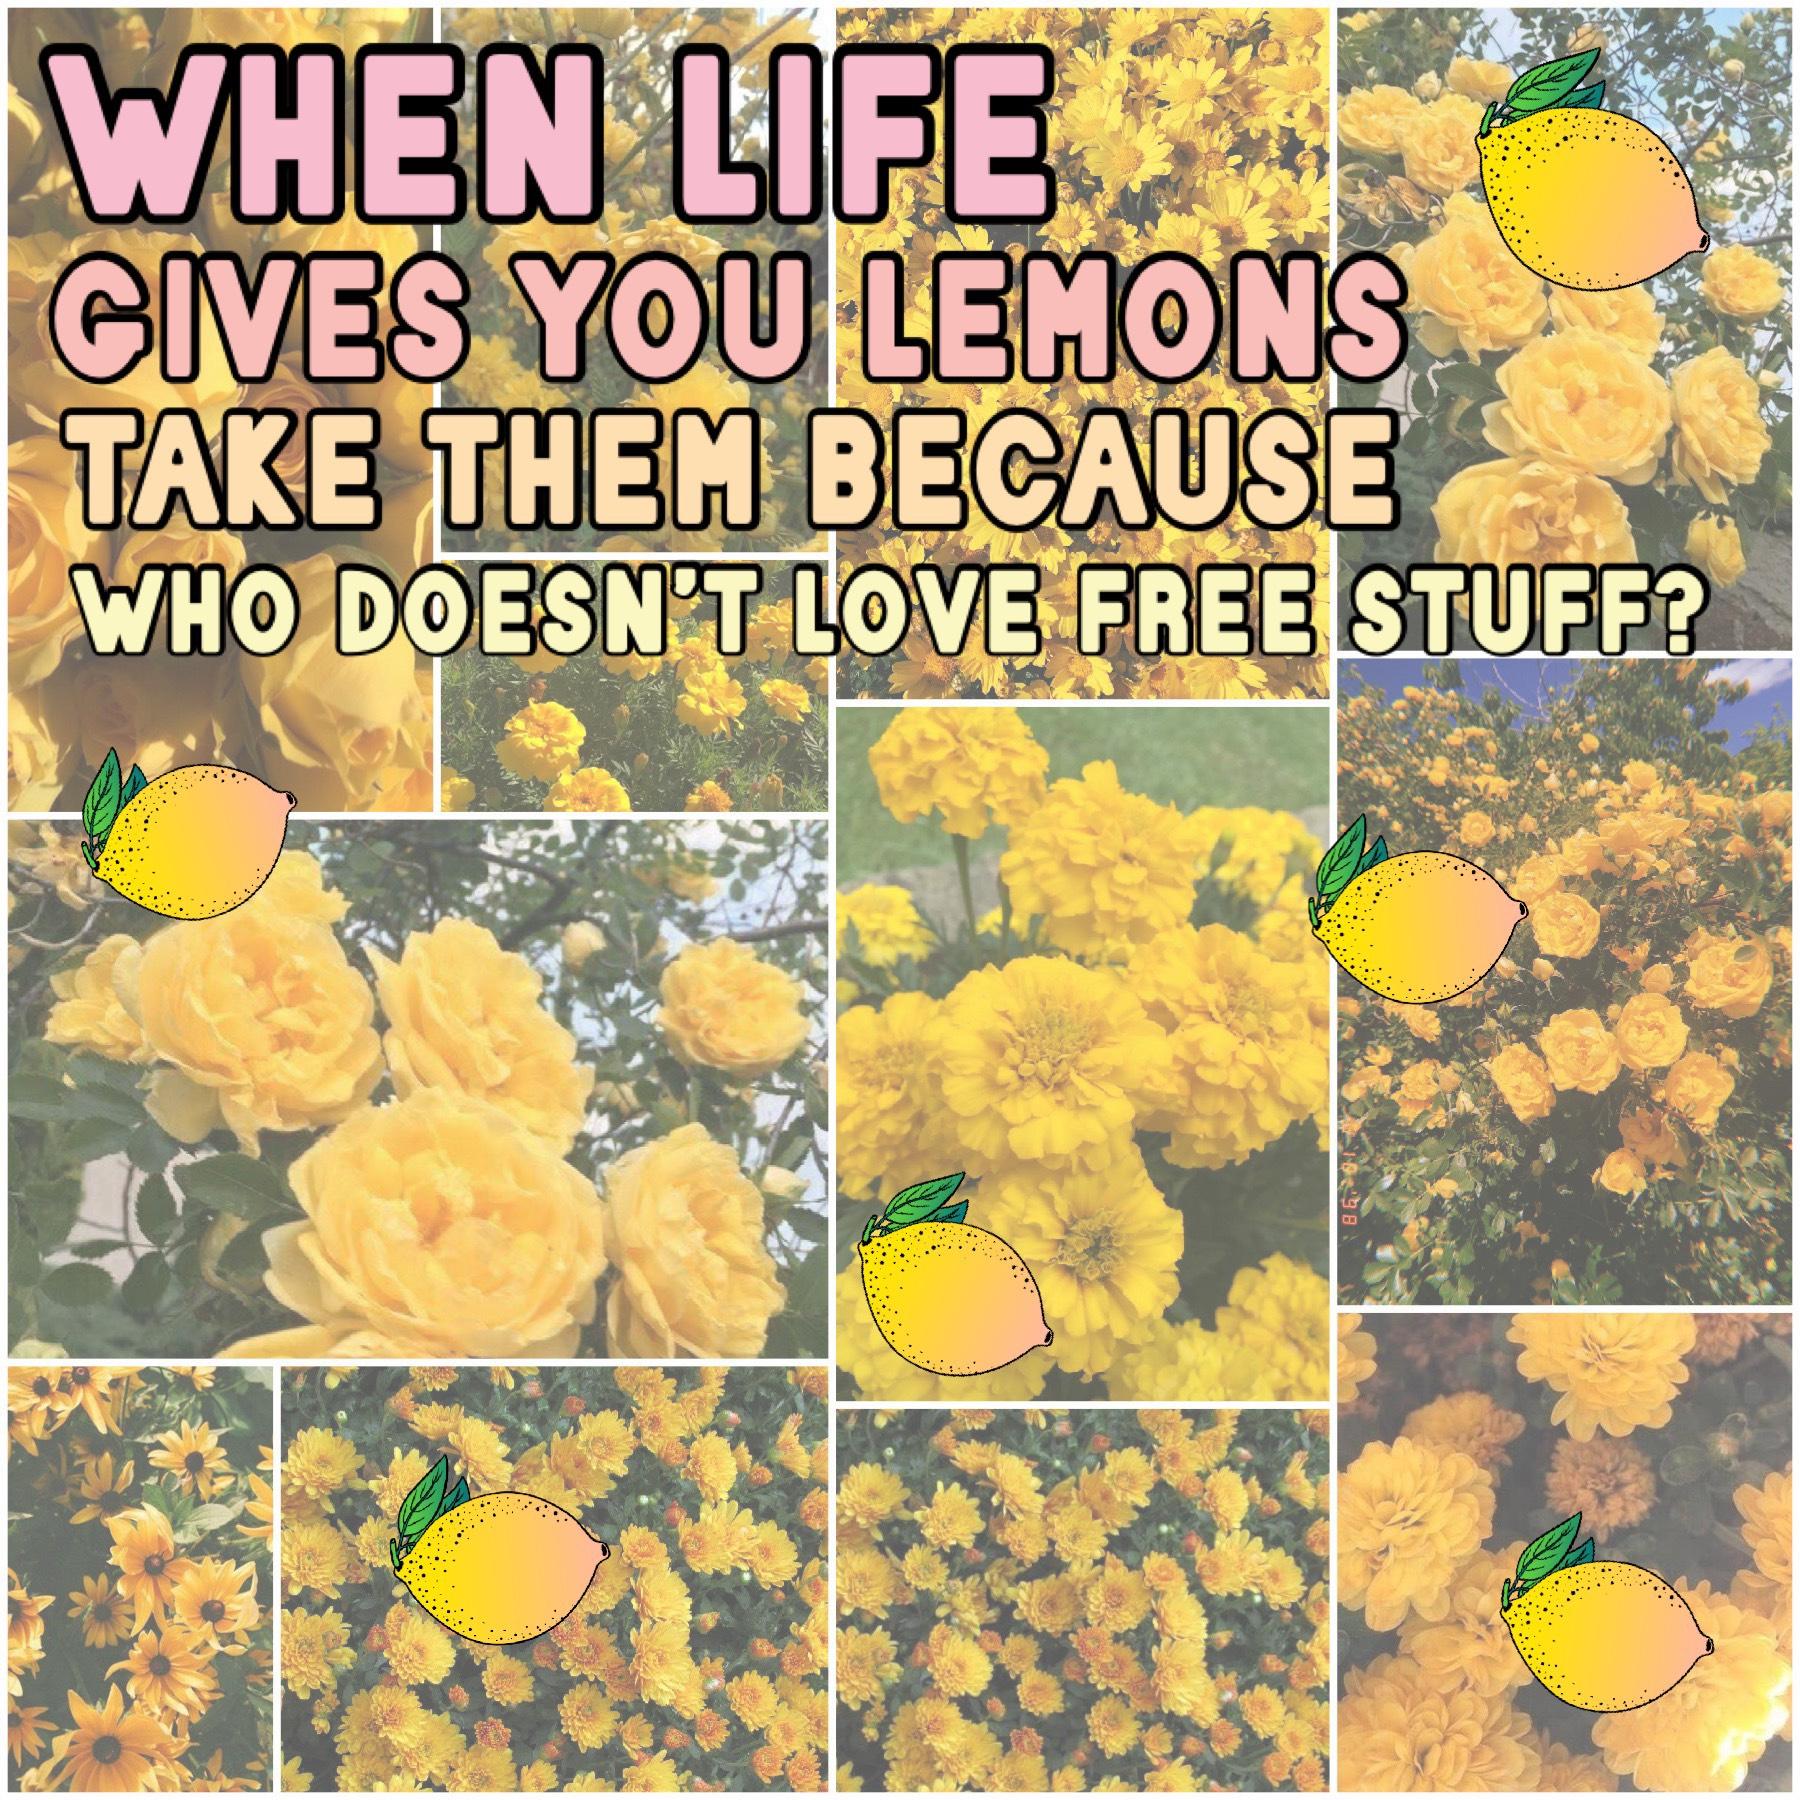 don't just make lemonade, make orange juice because maybe life gave you oranges too